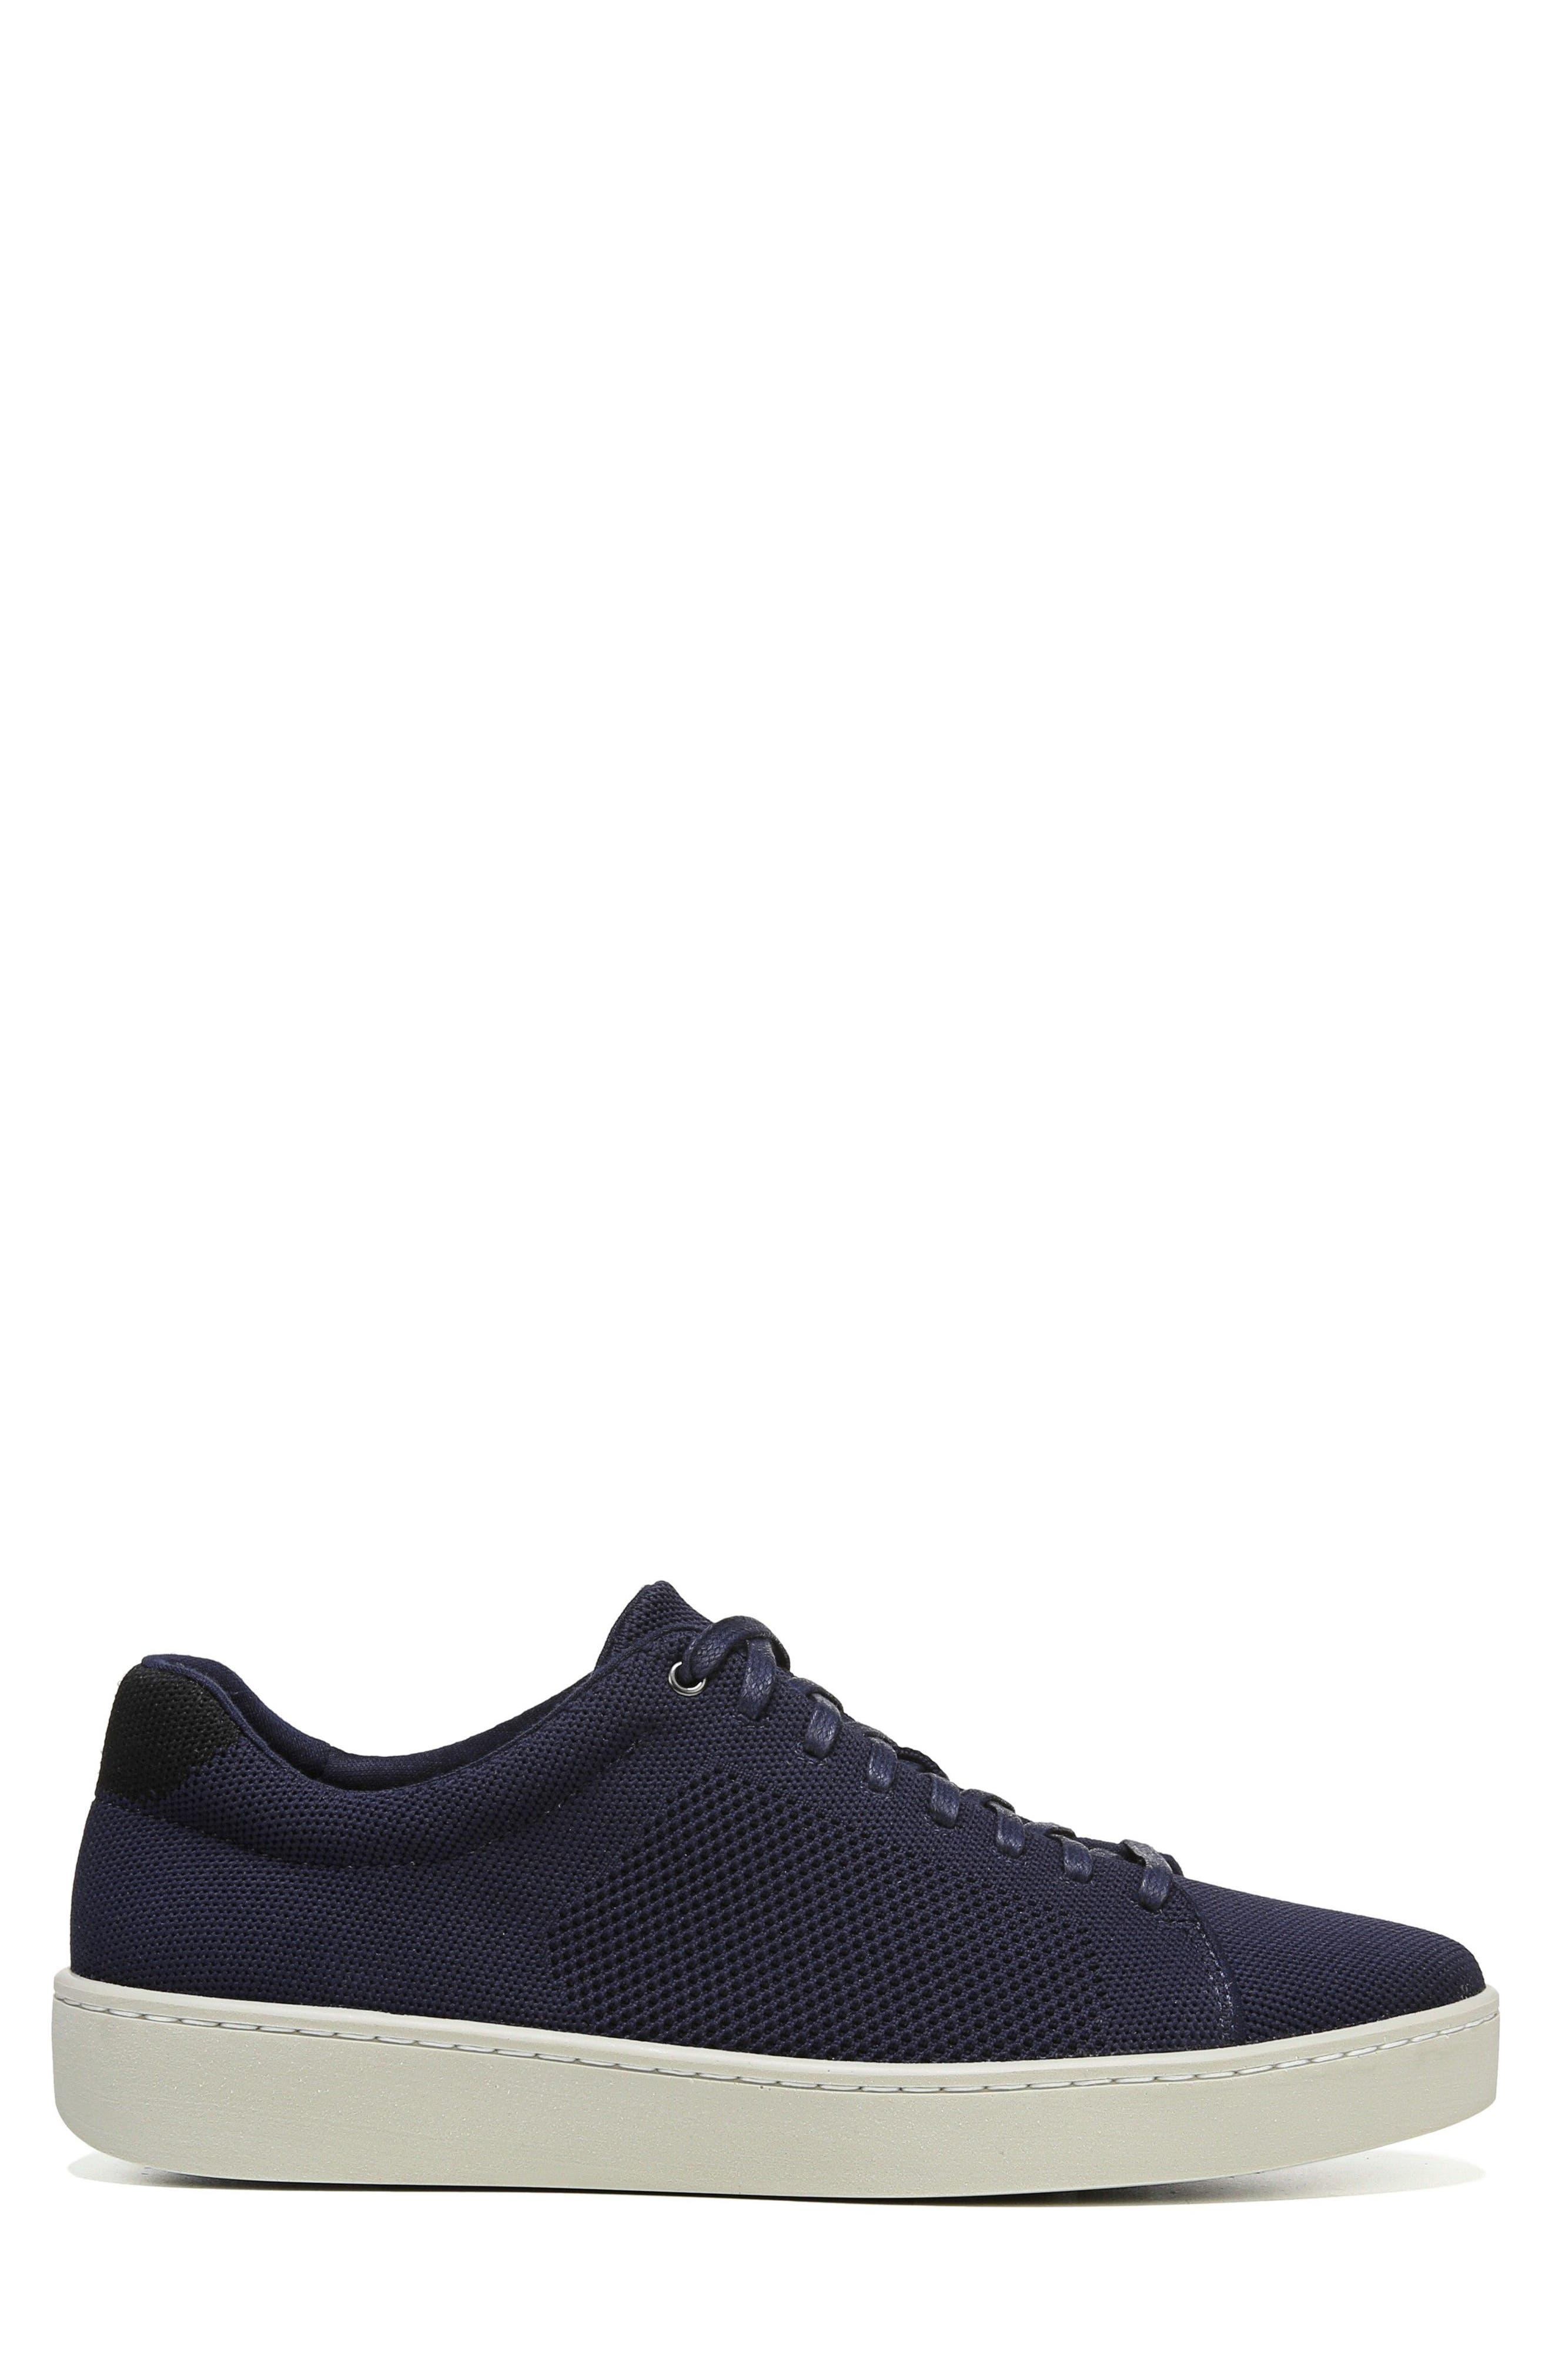 Silos Knit Low Top Sneaker,                             Alternate thumbnail 3, color,                             COASTAL